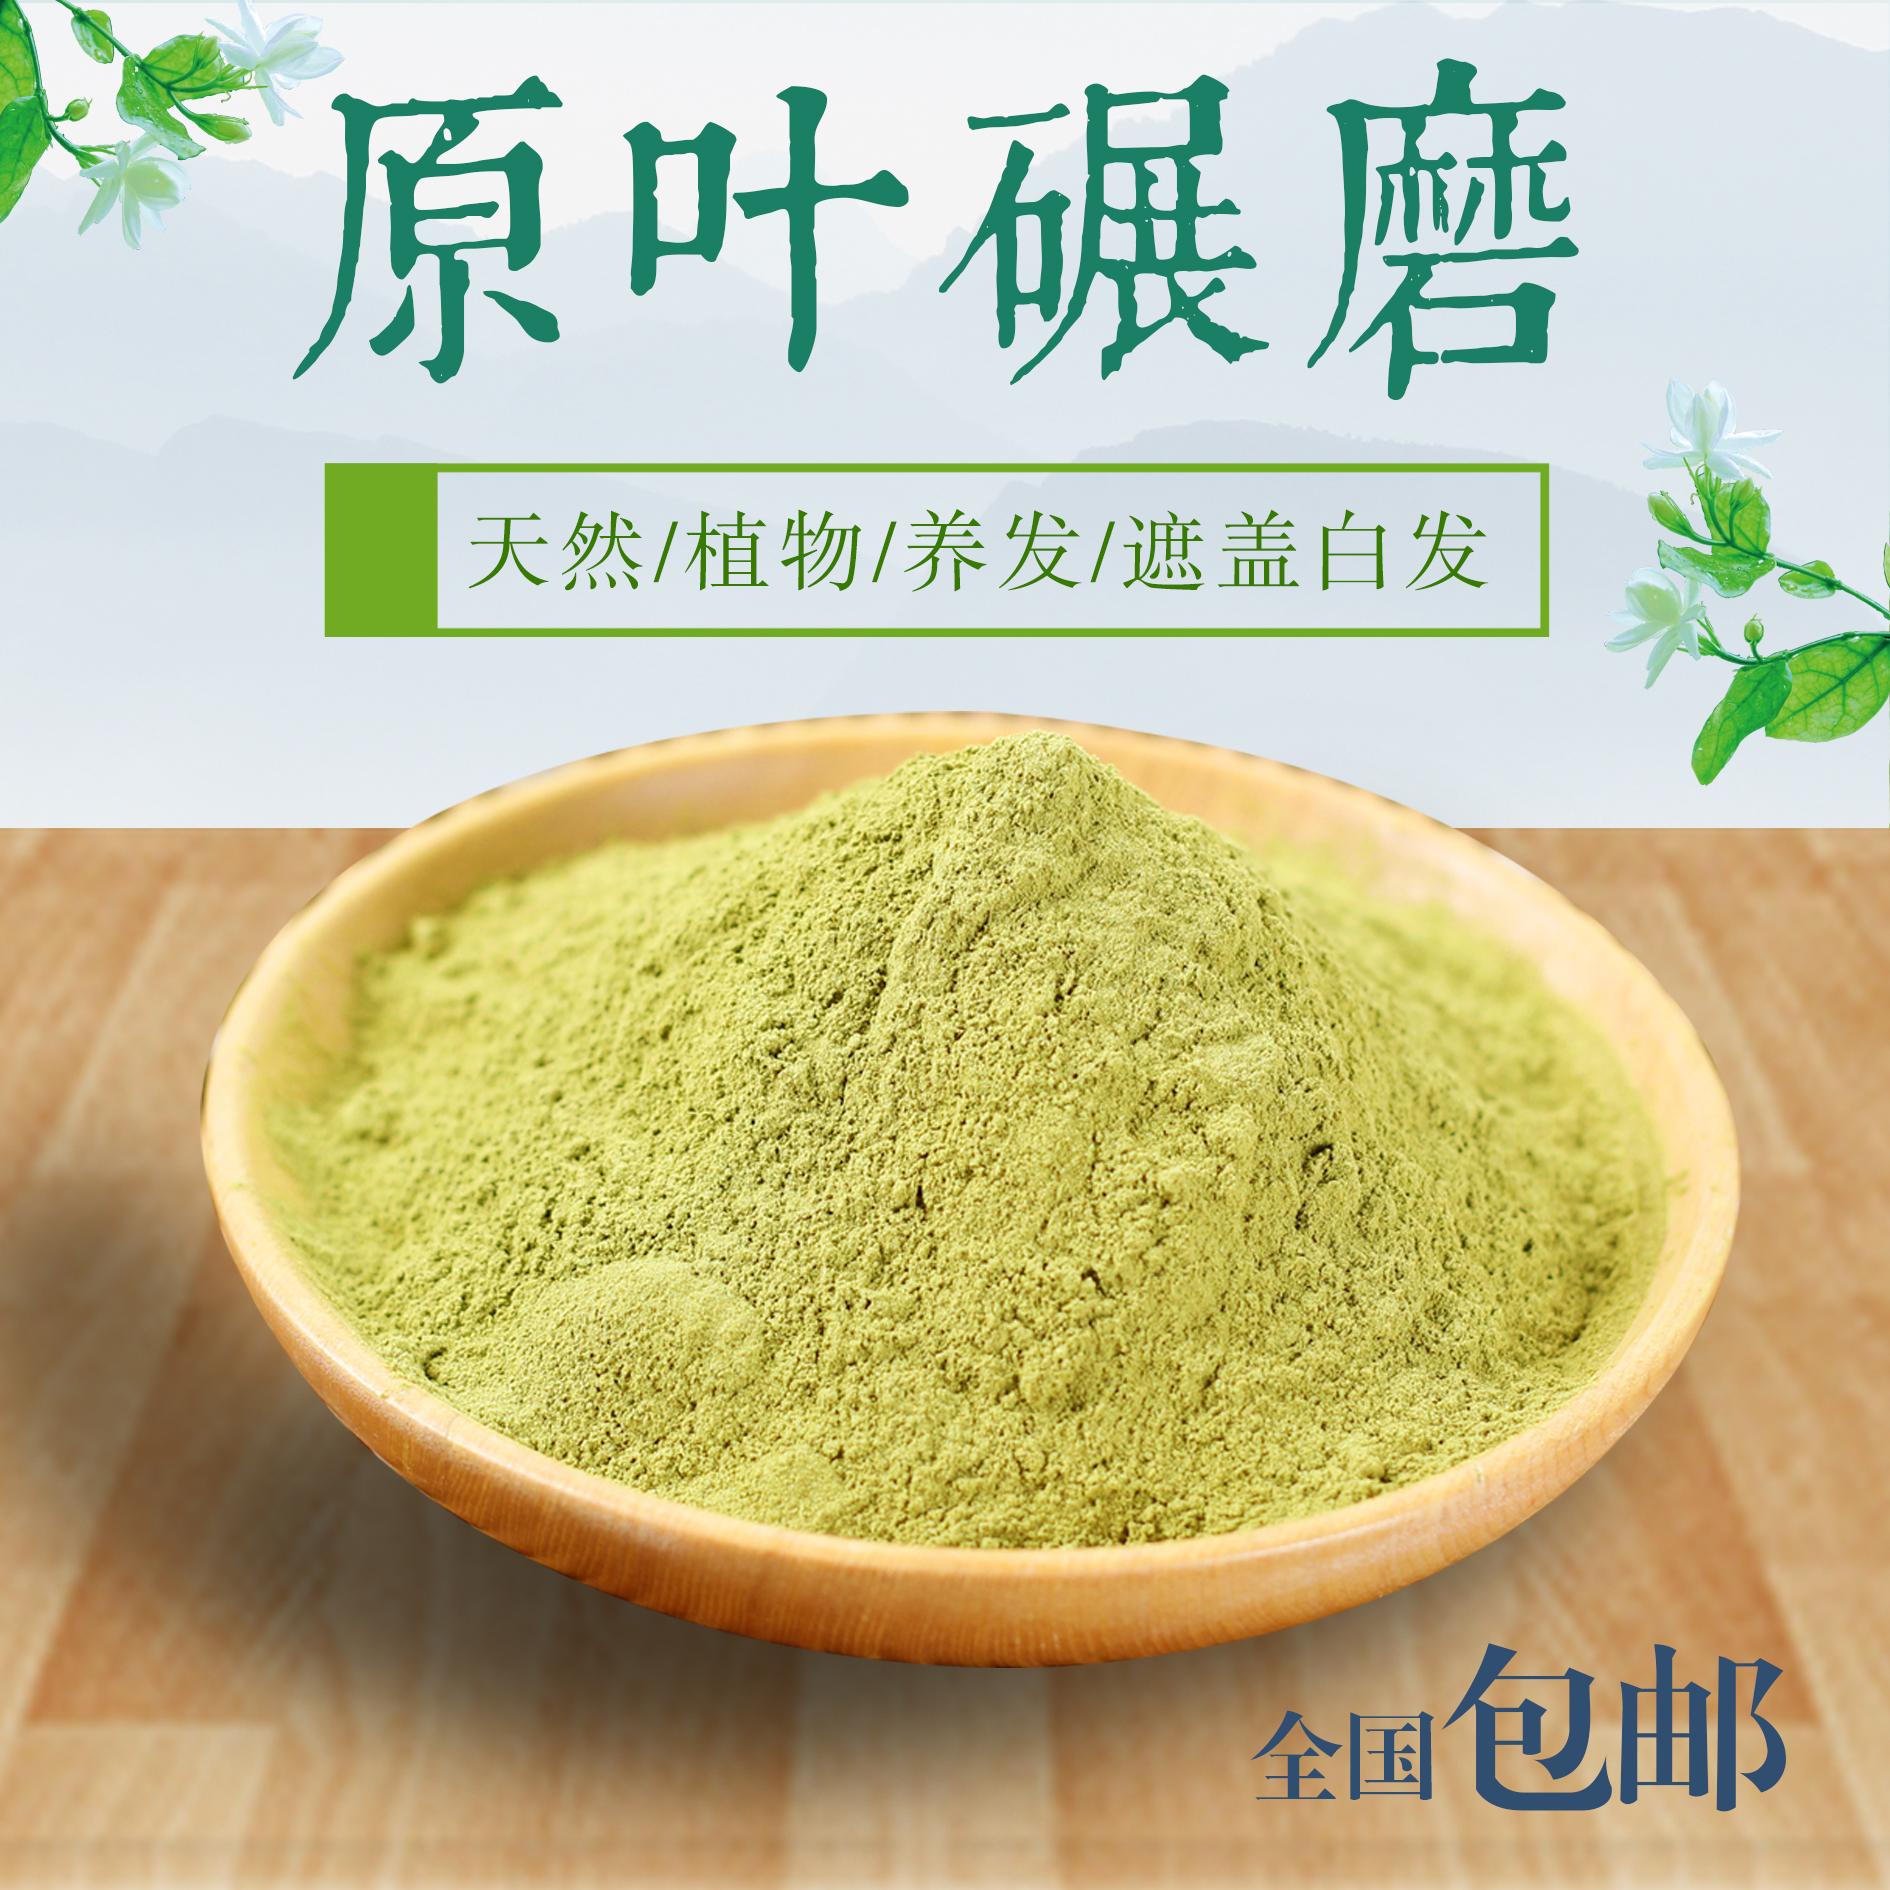 Haina powder imported from India